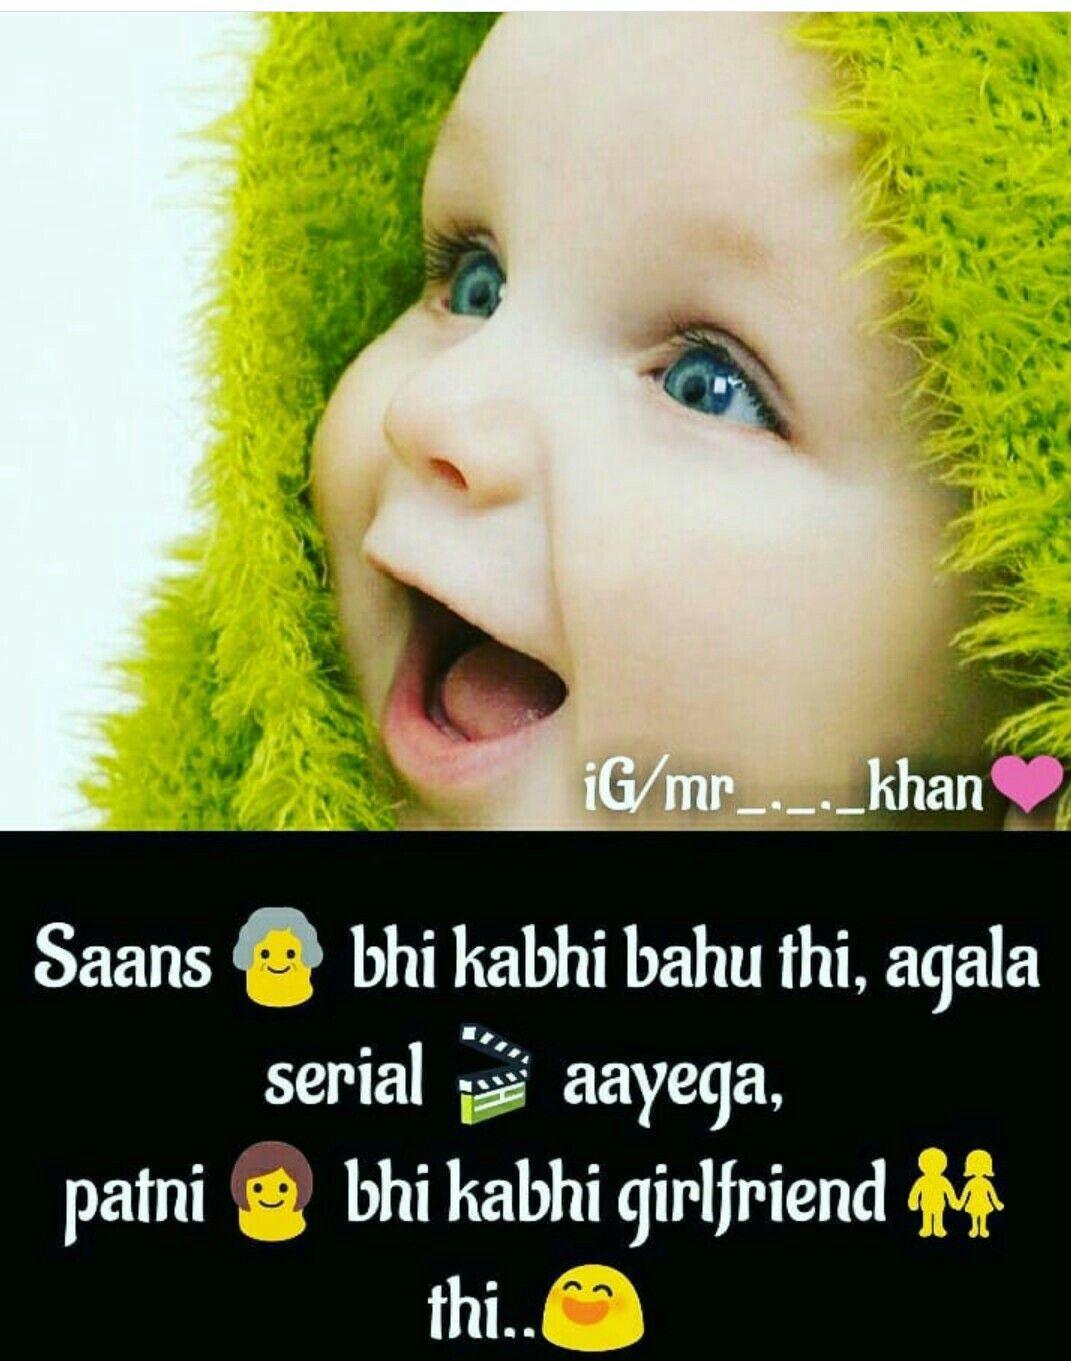 Pin By Devikasujata Singh On Dil Ki Shayeri Cute Baby Quotes Baby Quotes Comedy Jokes